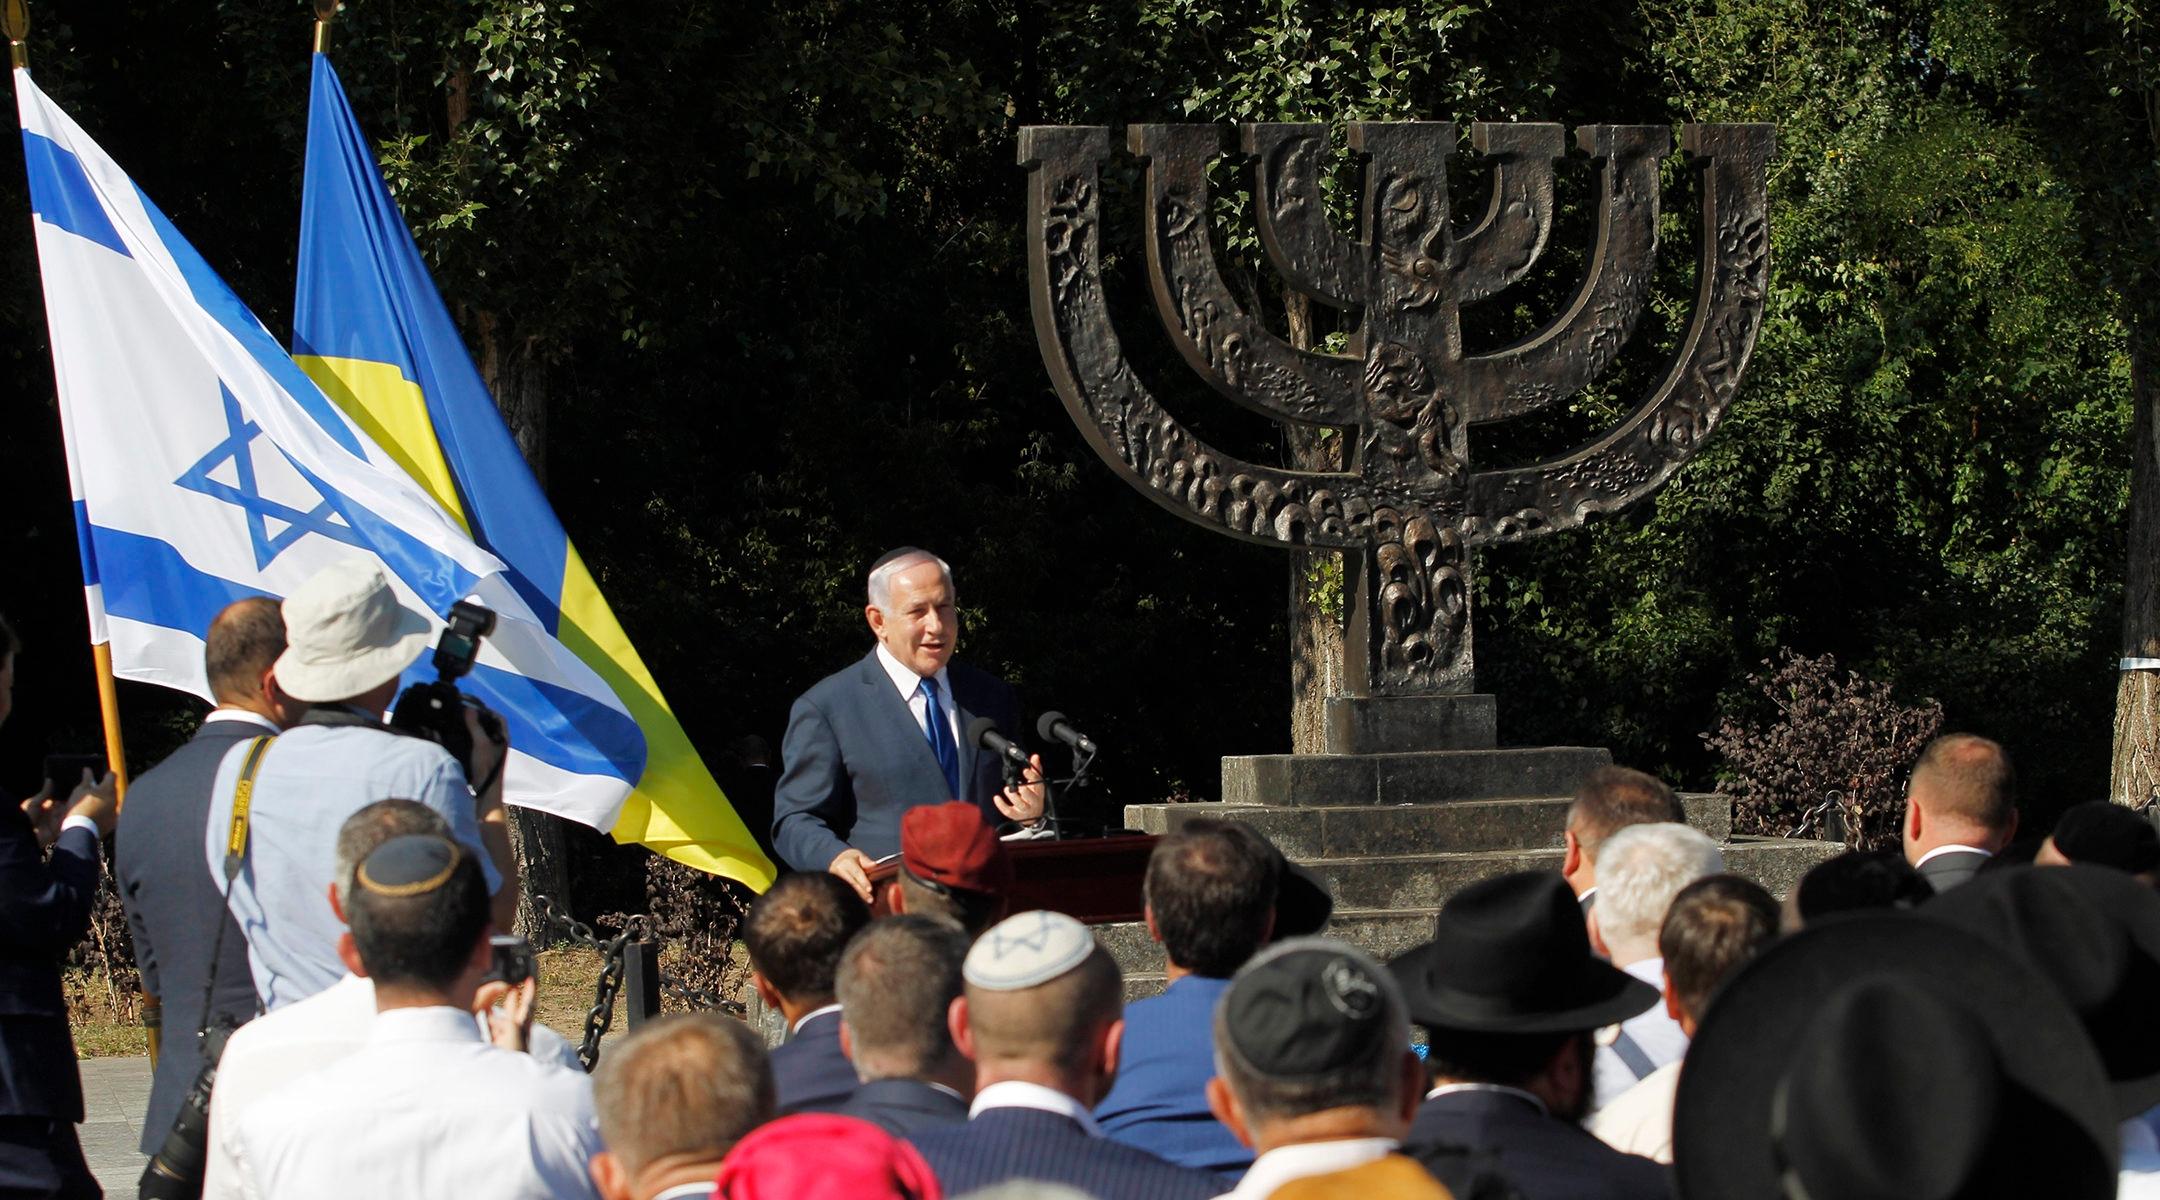 Israeli Prime Minister Benjamin Netanyahu speaking at the Babi Yar Holocaust monument near Kiev, Ukraine on Aug. 19, 2019. (Pavlo Gonchar/SOPA Images/LightRocket via Getty Images)